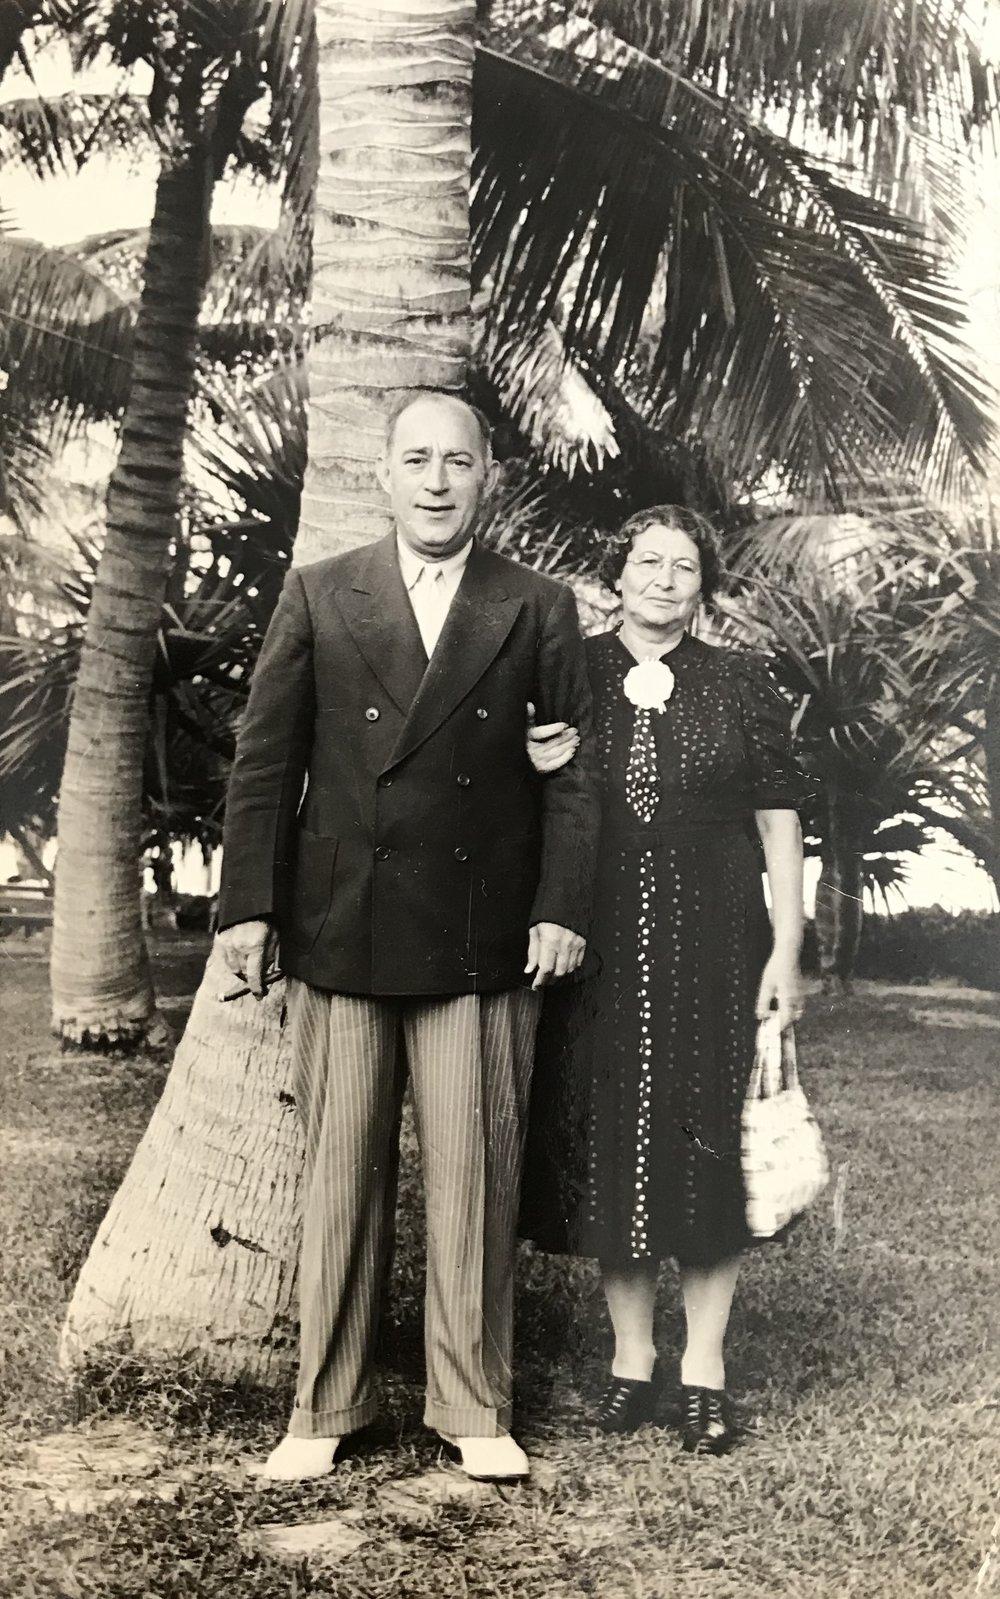 Nettie and Phillip Silverman, Miami Beach, early 1940's.